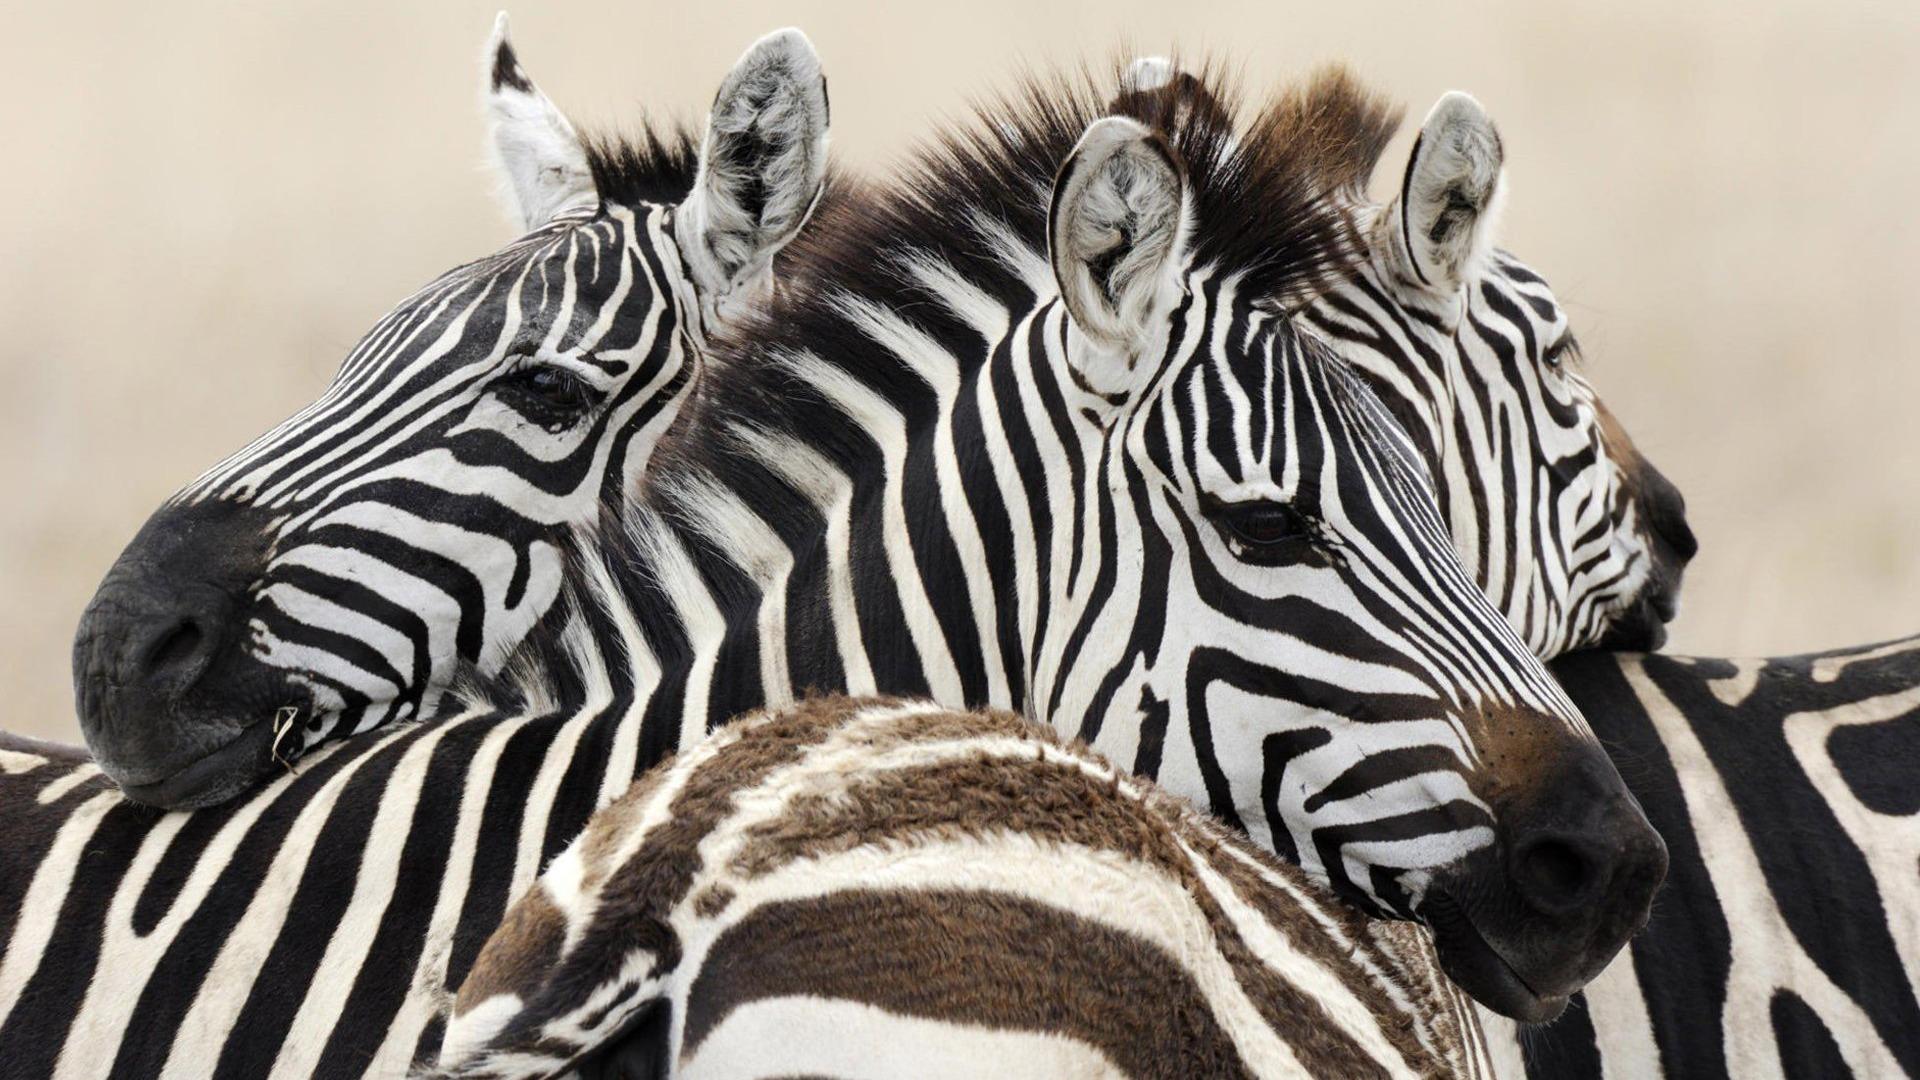 wallpaper: Zebra HD Wallpapers